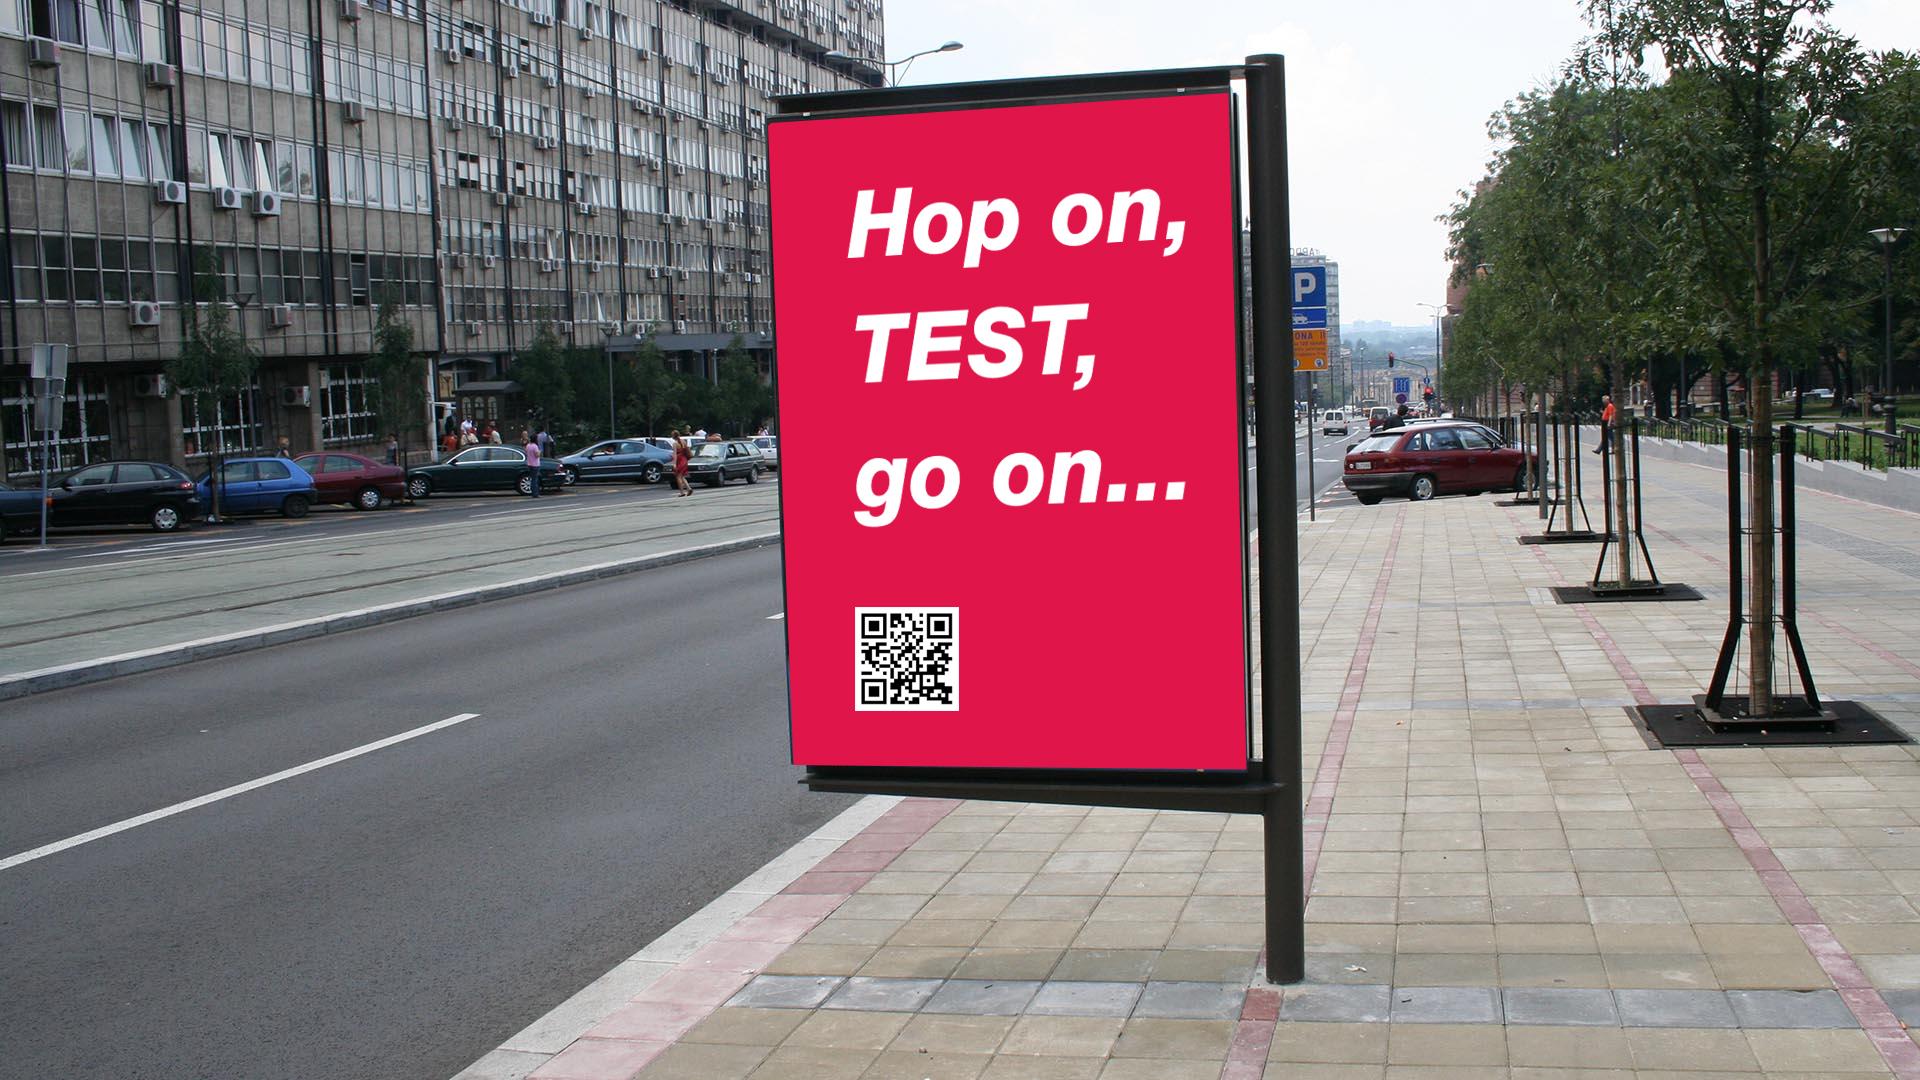 http://newform.media/wp-content/uploads/2020/02/tramp-station.jpg